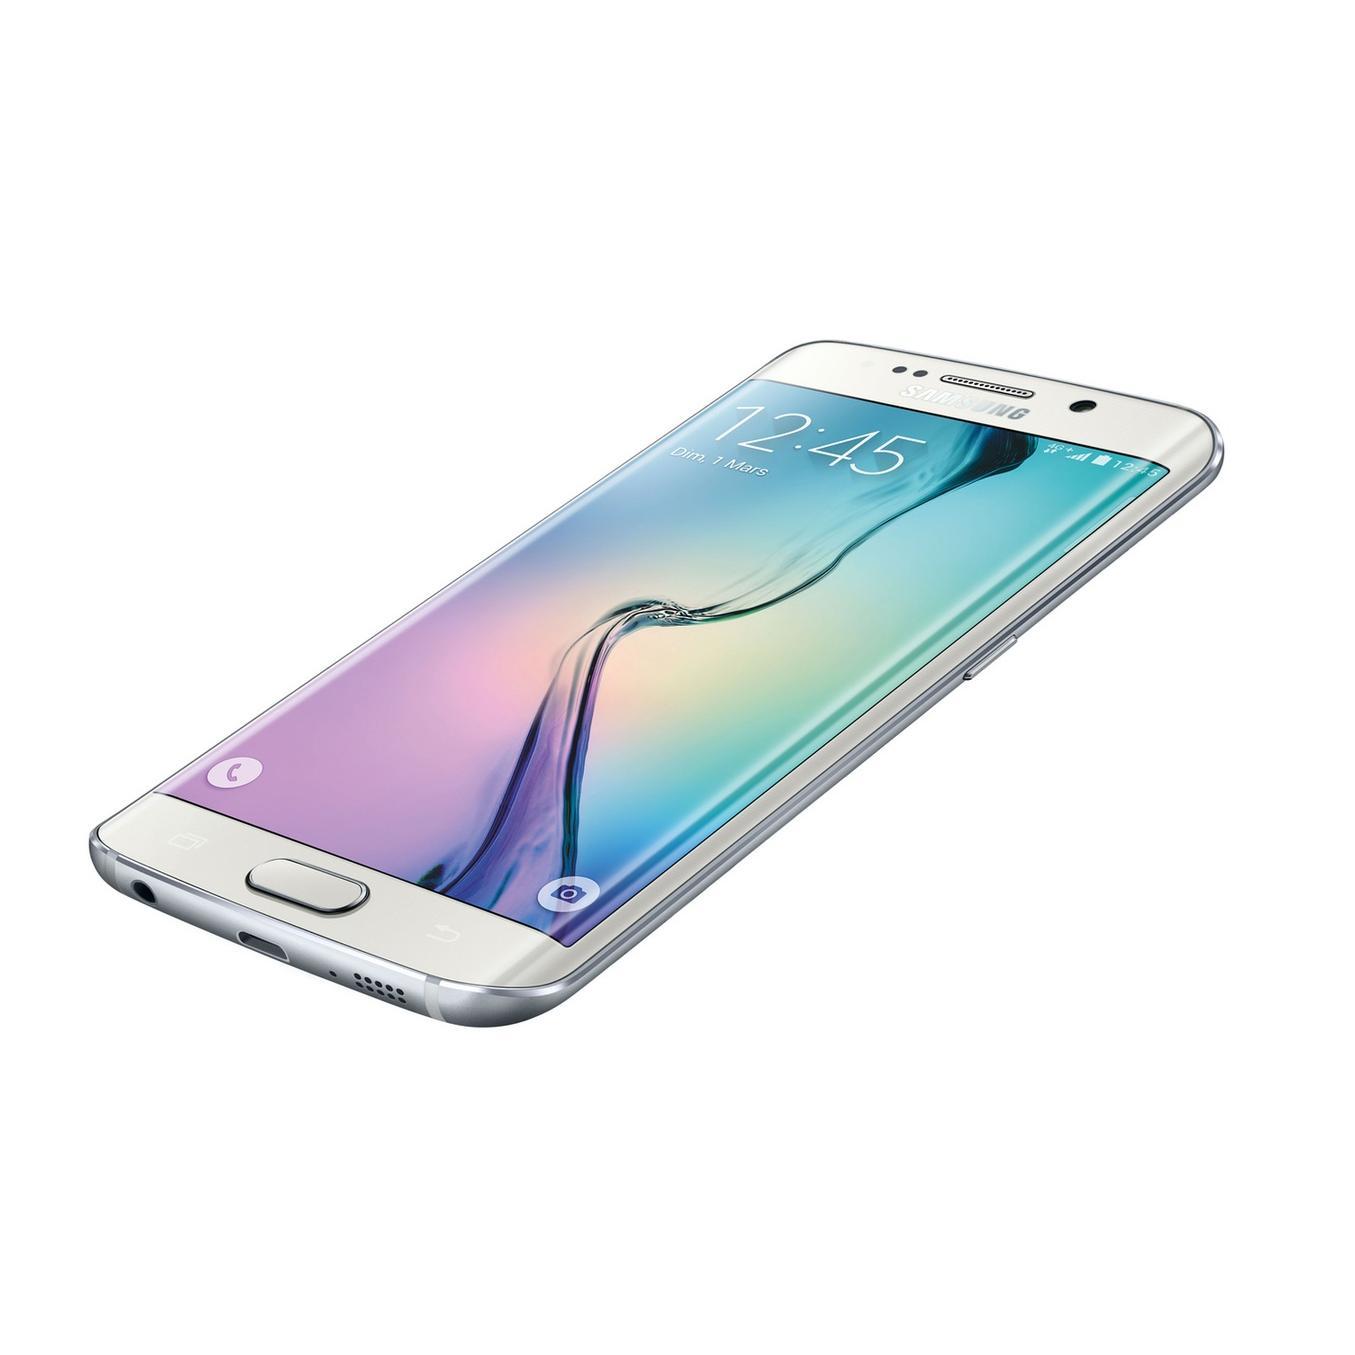 Samsung Galaxy S6 Edge 64 GB - Blanco - Libre